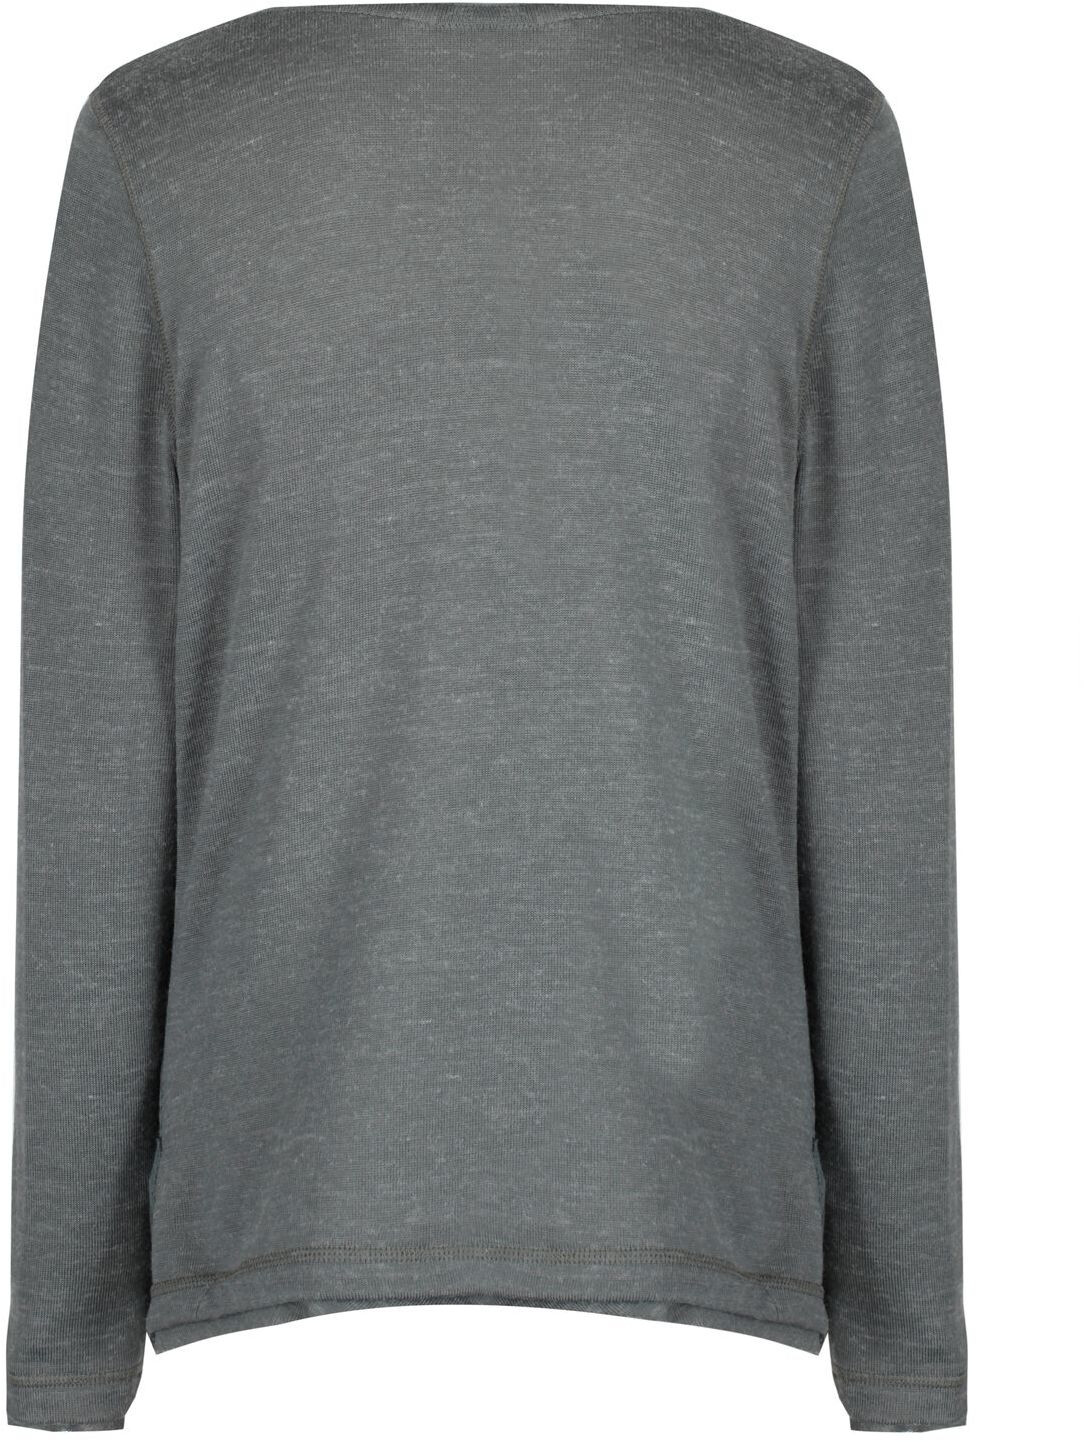 92e2c6381dd Womens Black T Shirt Long